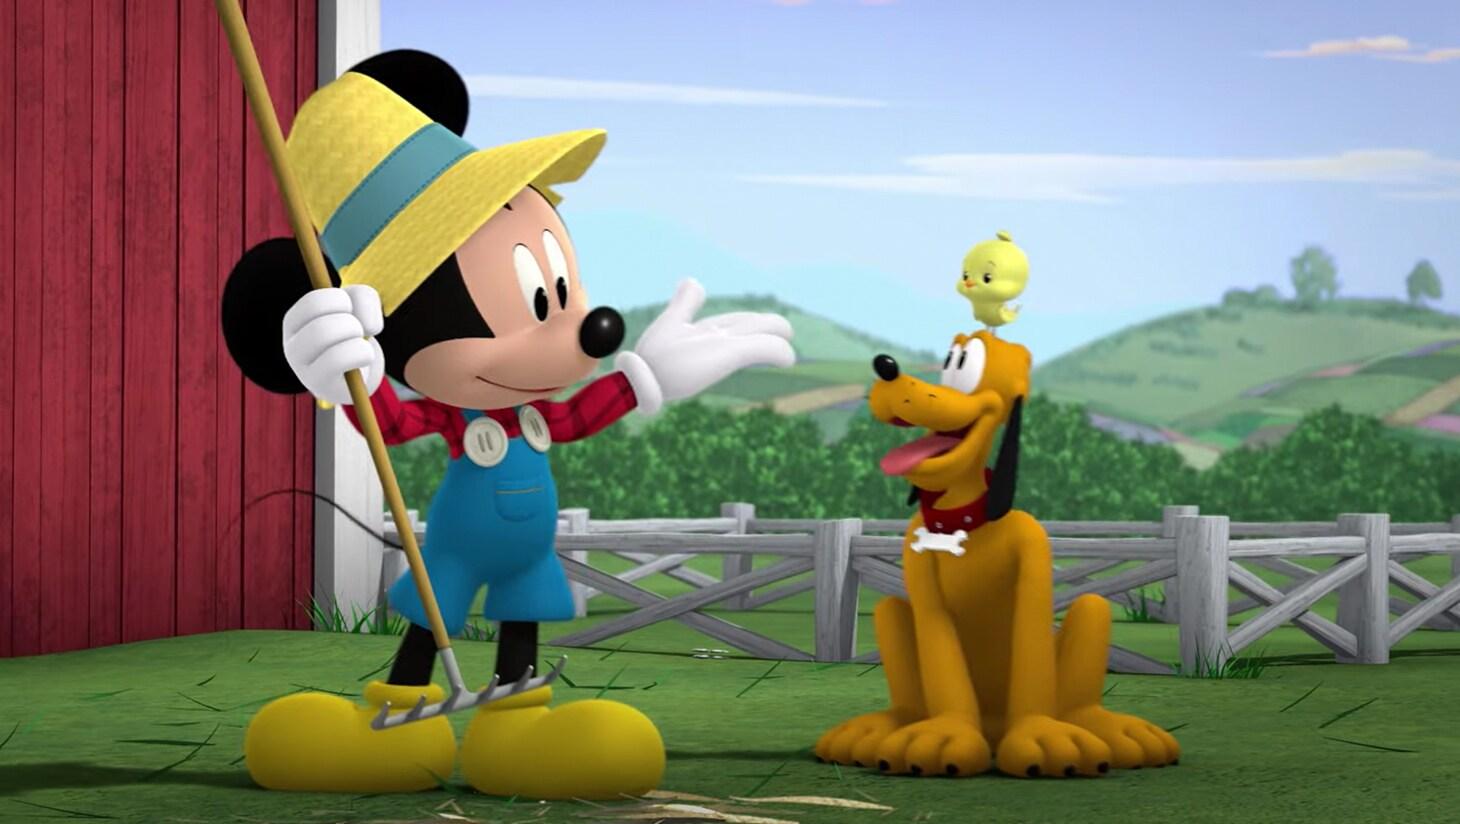 Mickey and Pluto on a farm